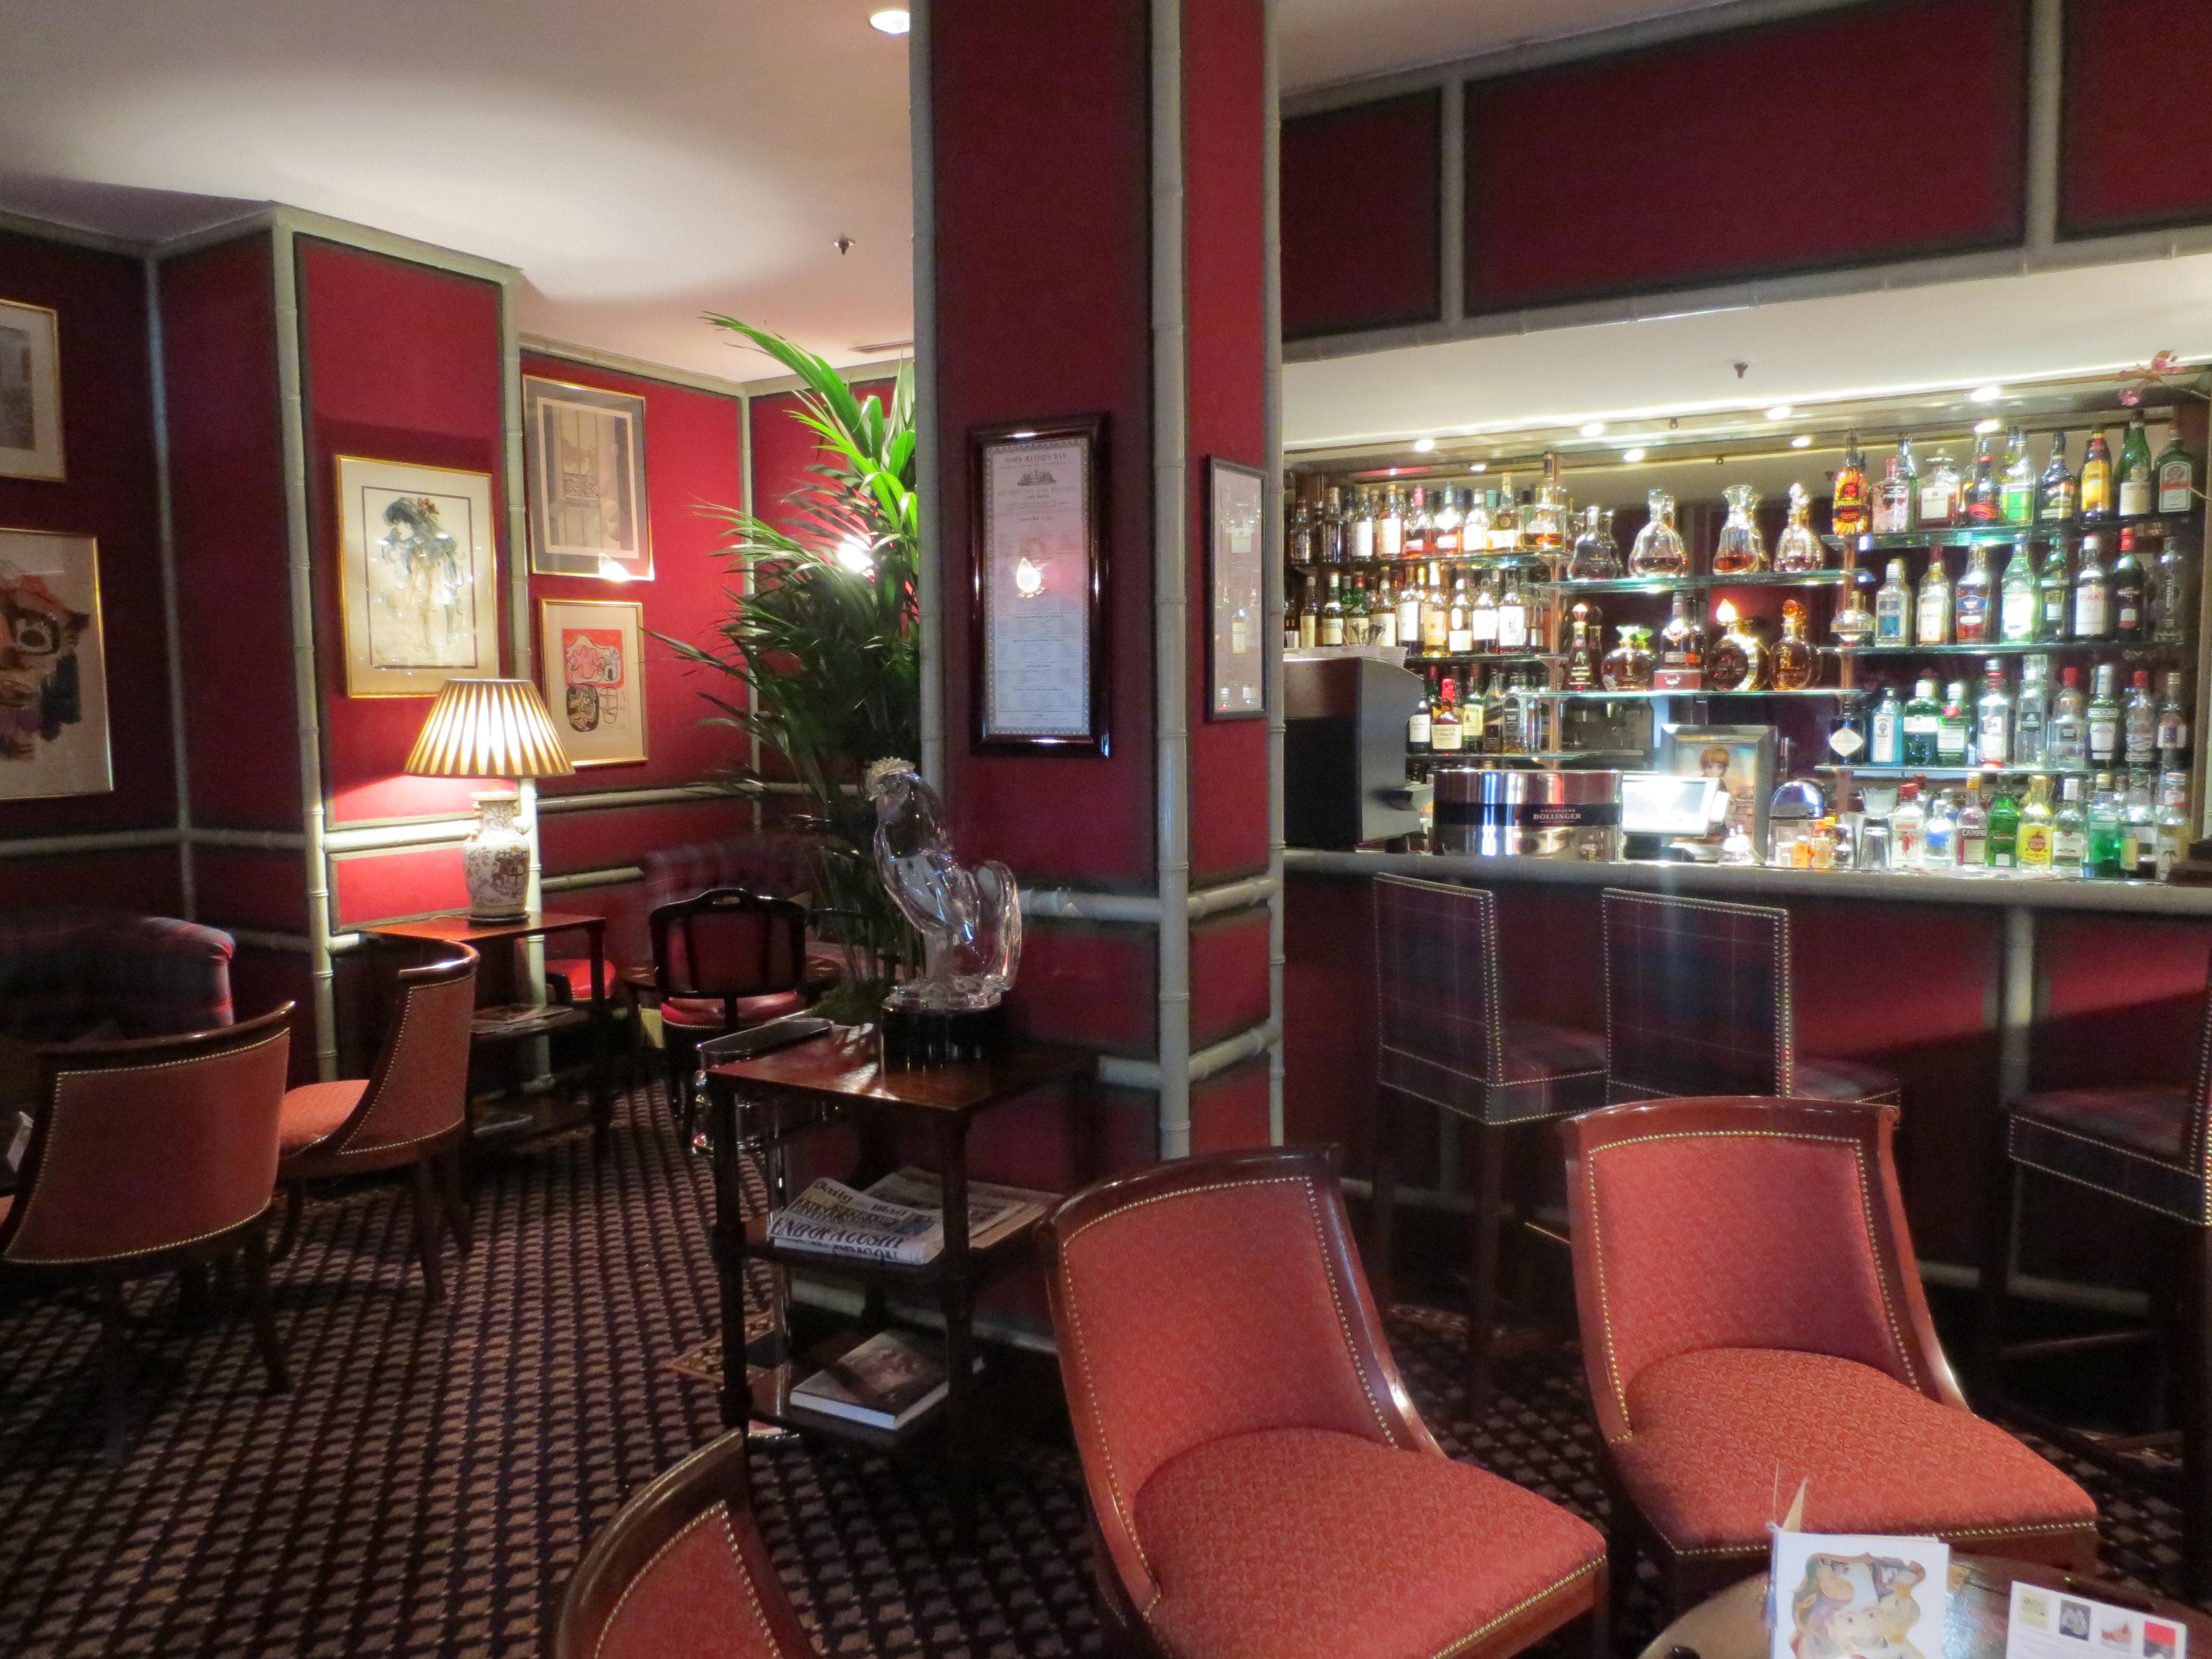 Restaurant Review: Le Gavroche | Travel Gourmet